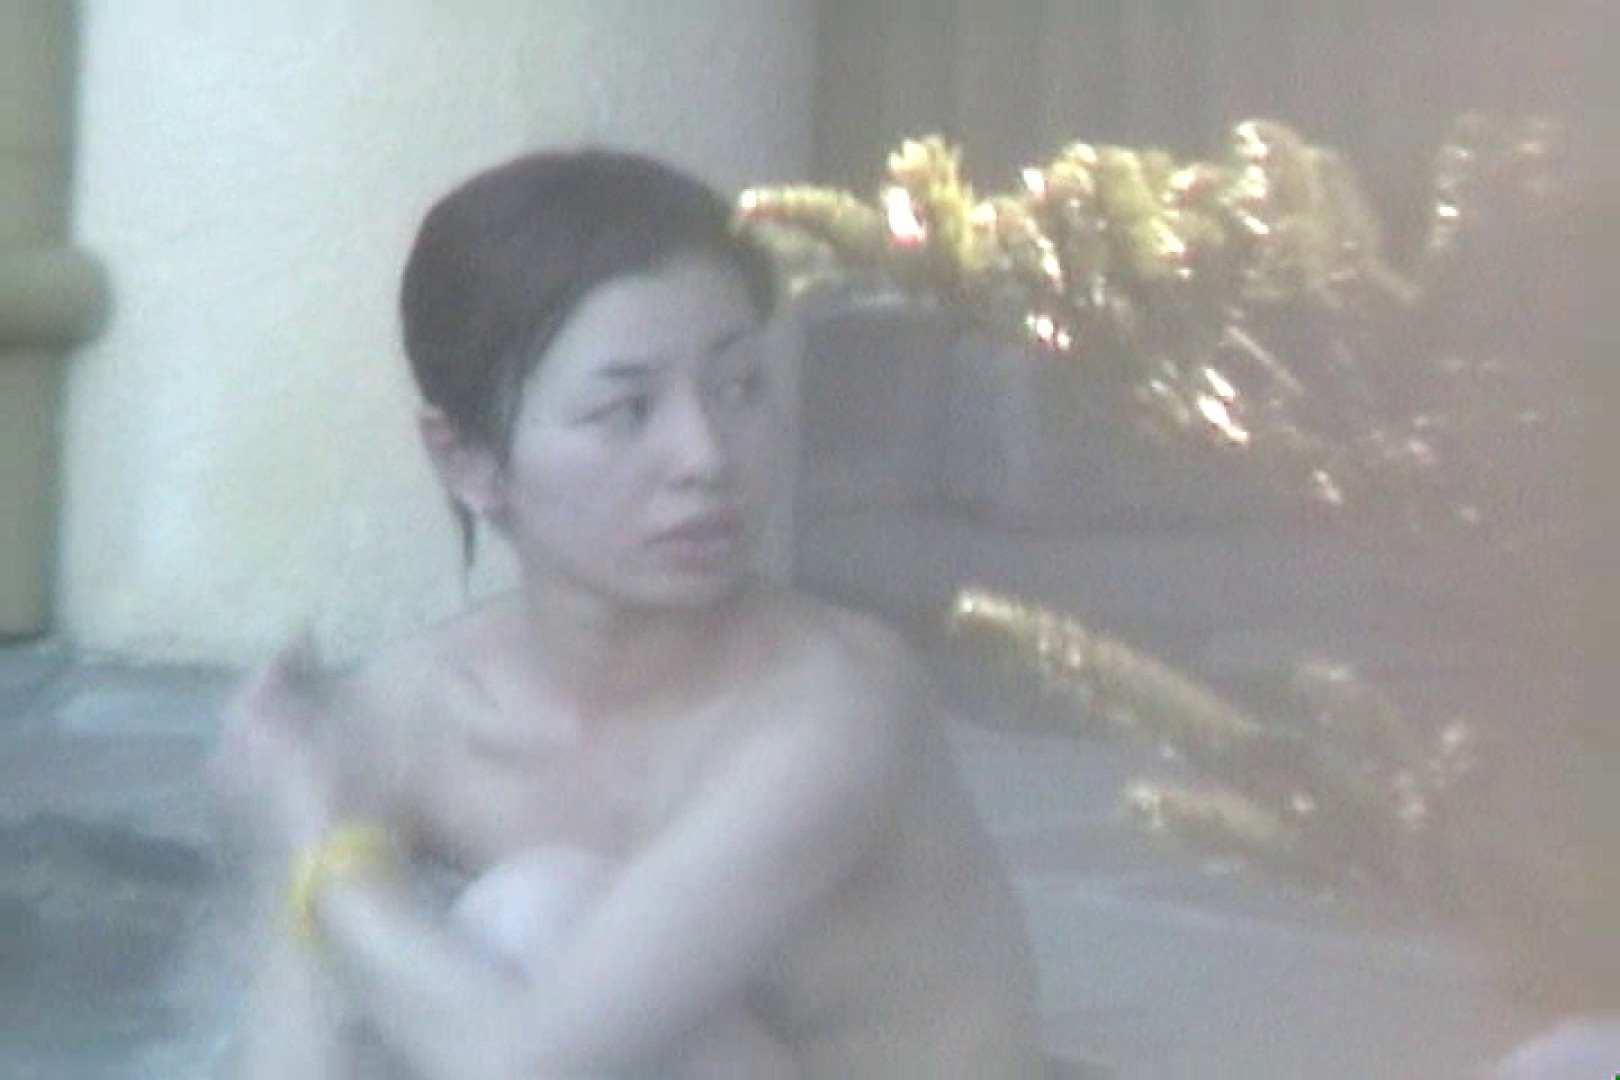 Aquaな露天風呂Vol.559 盗撮大放出 オマンコ無修正動画無料 72連発 13